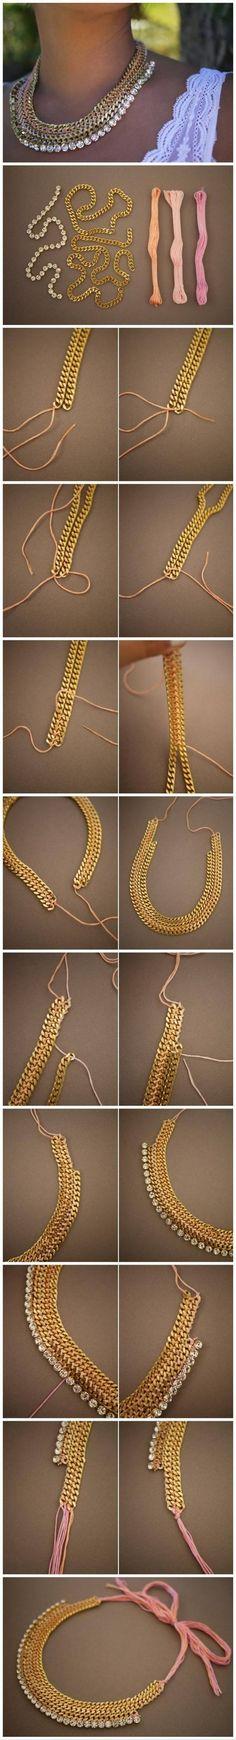 10 Amazing DIY Necklaces Tutorials | Planet of Women- Health, Fashion & Beauty